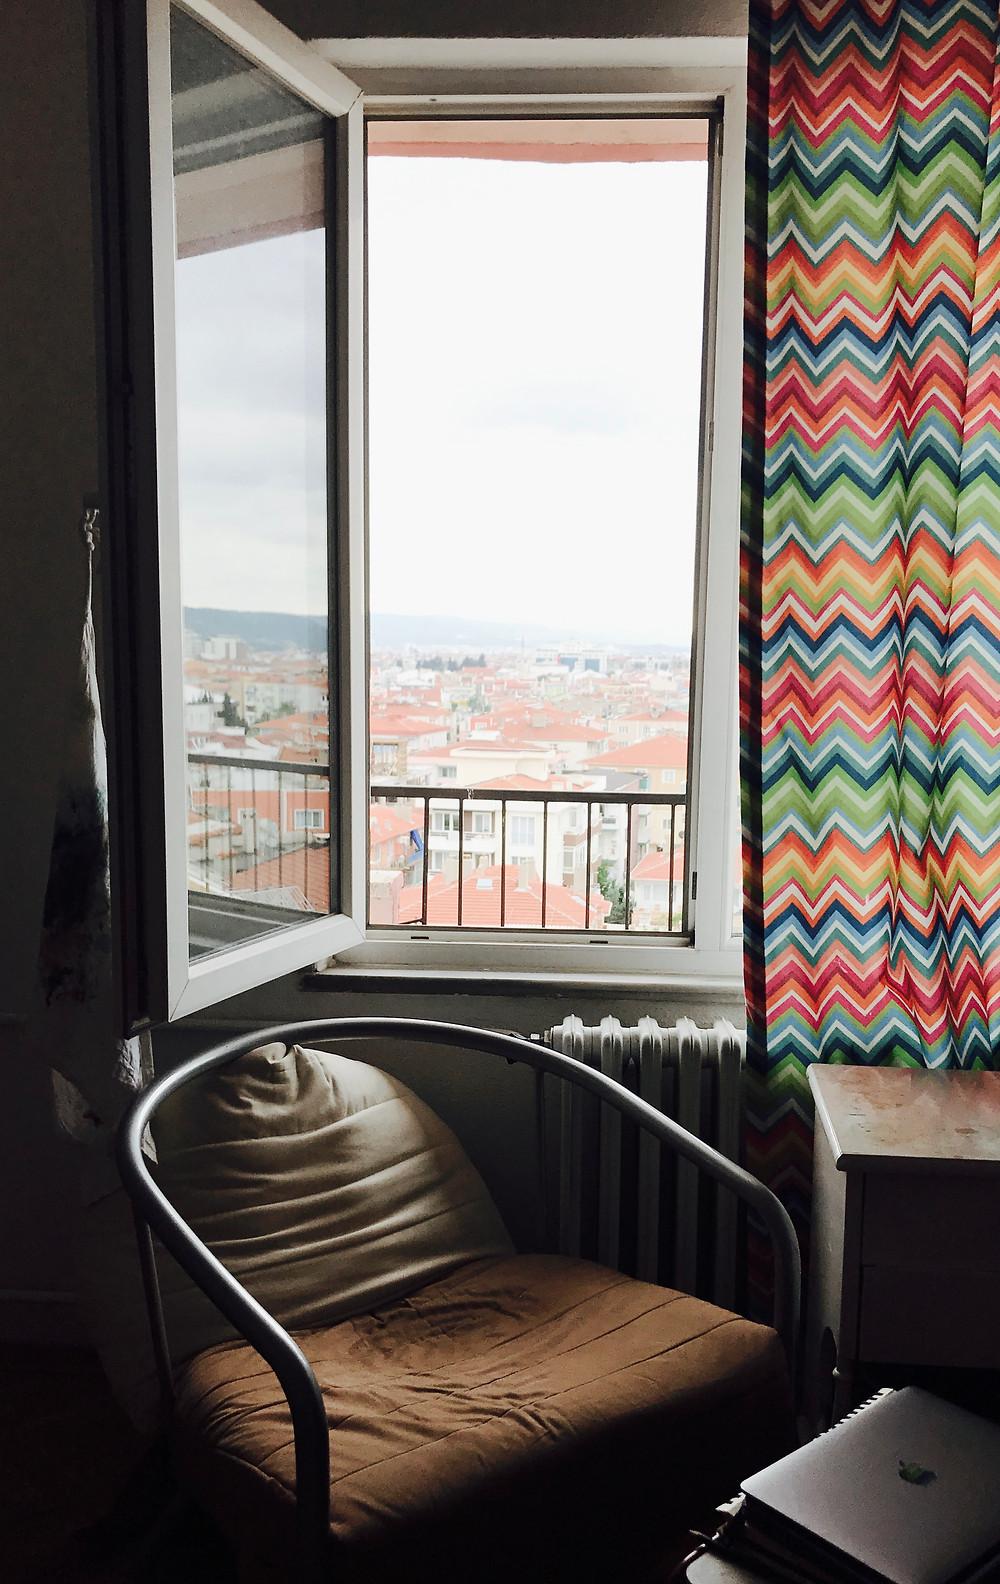 The window at The Studio